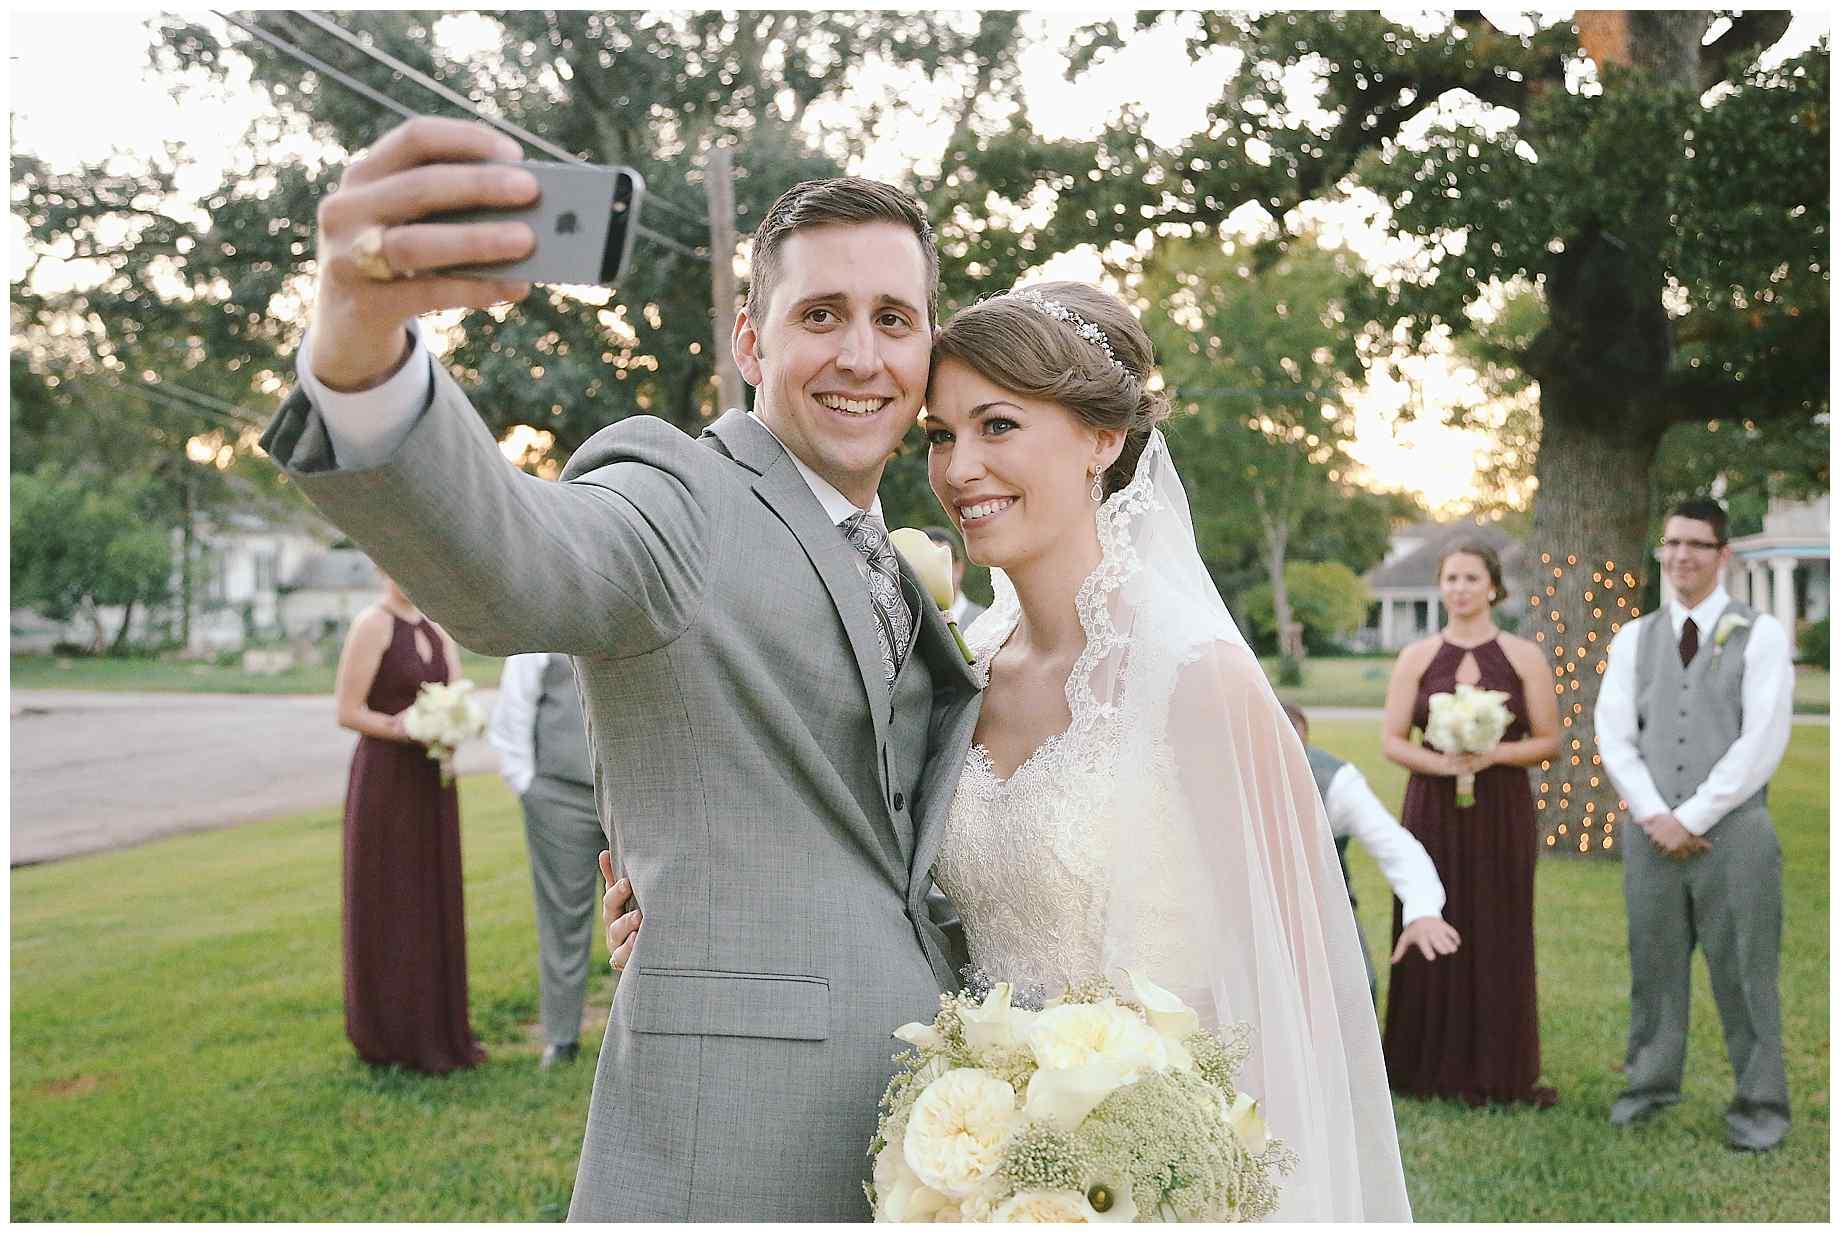 best-wedding-photos-2014-08